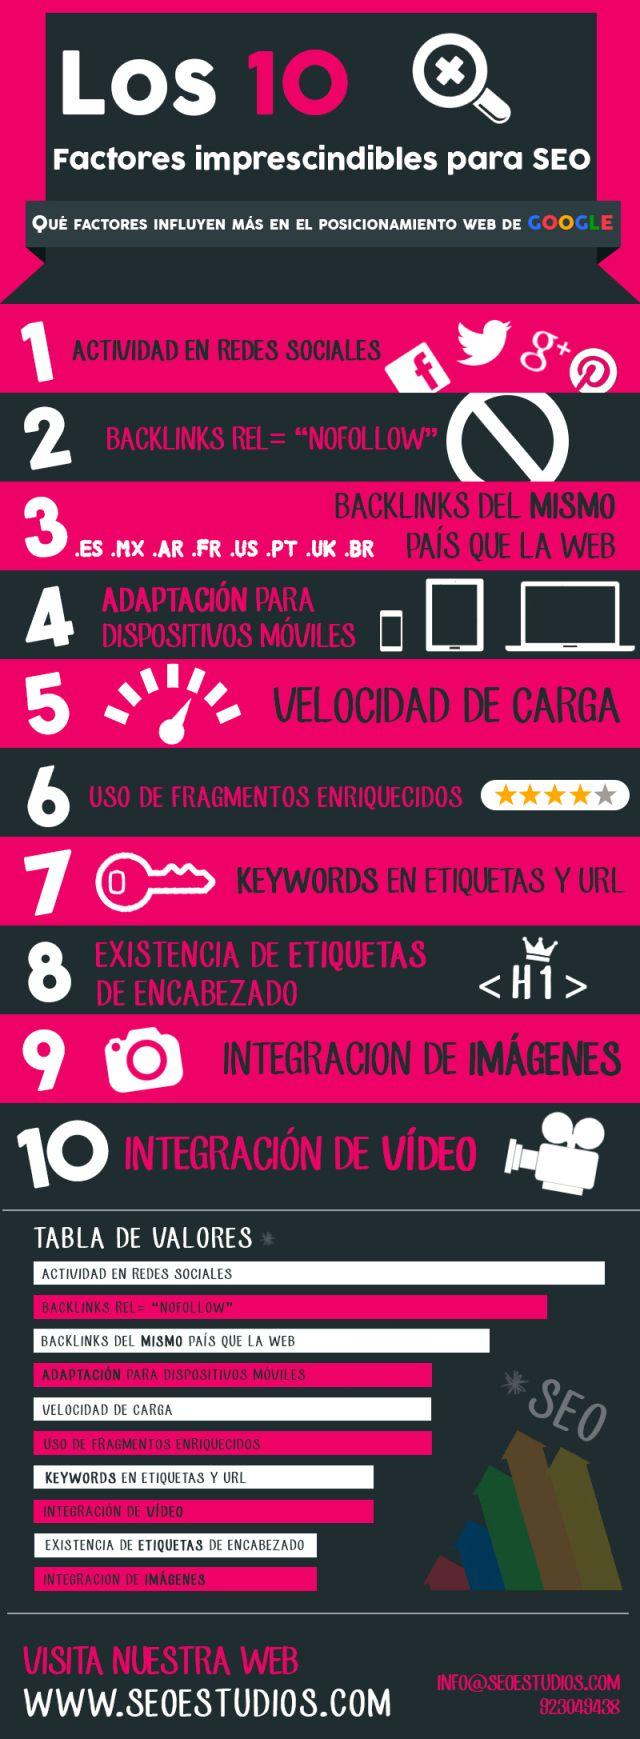 Una infografía con 10 factores imprescindibles para #SEO.